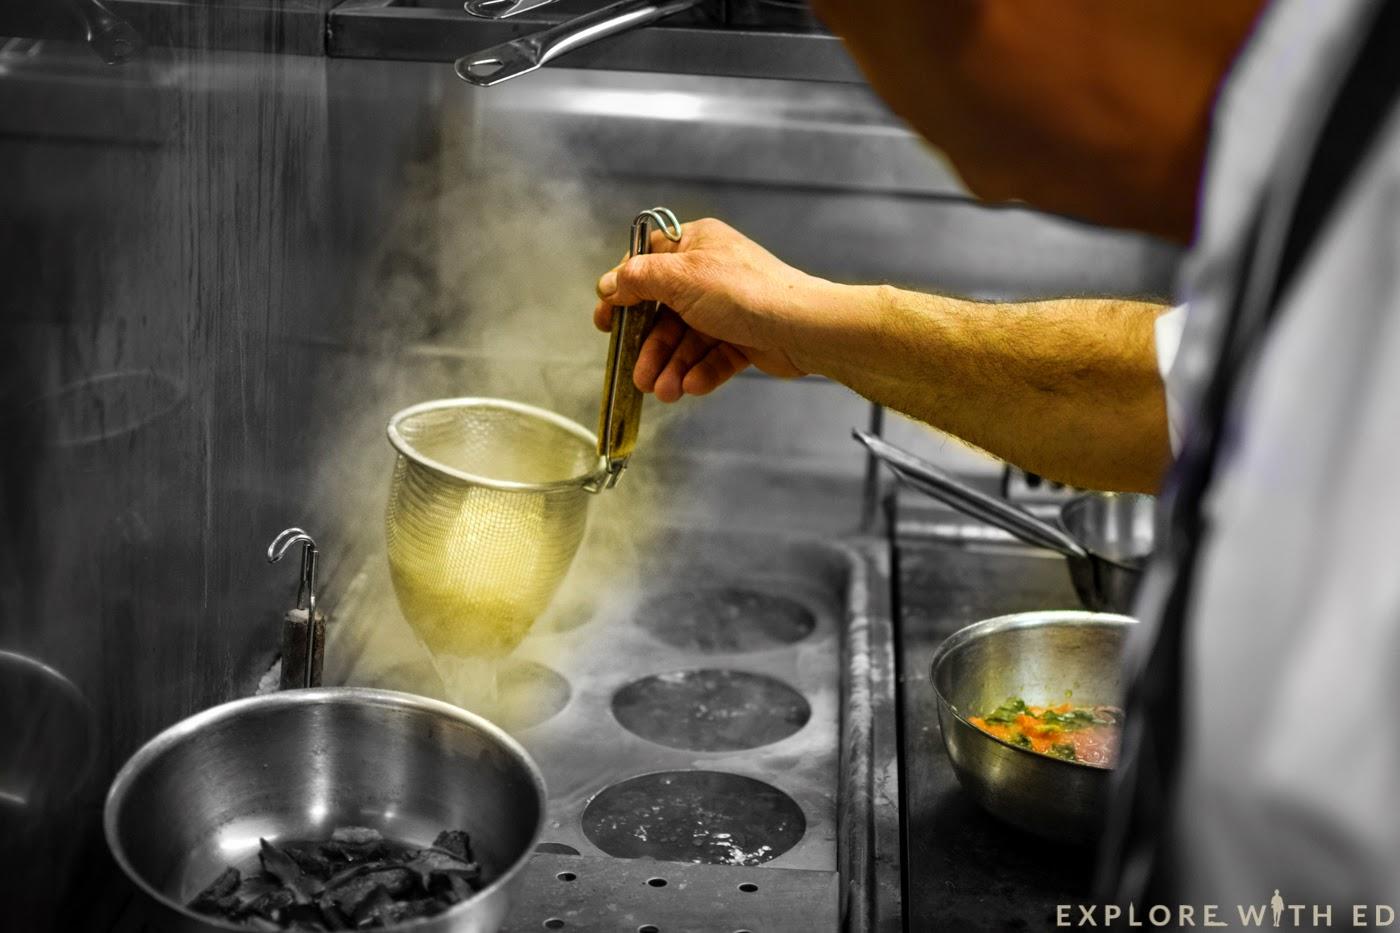 Boiling pasta Jamie's Italian